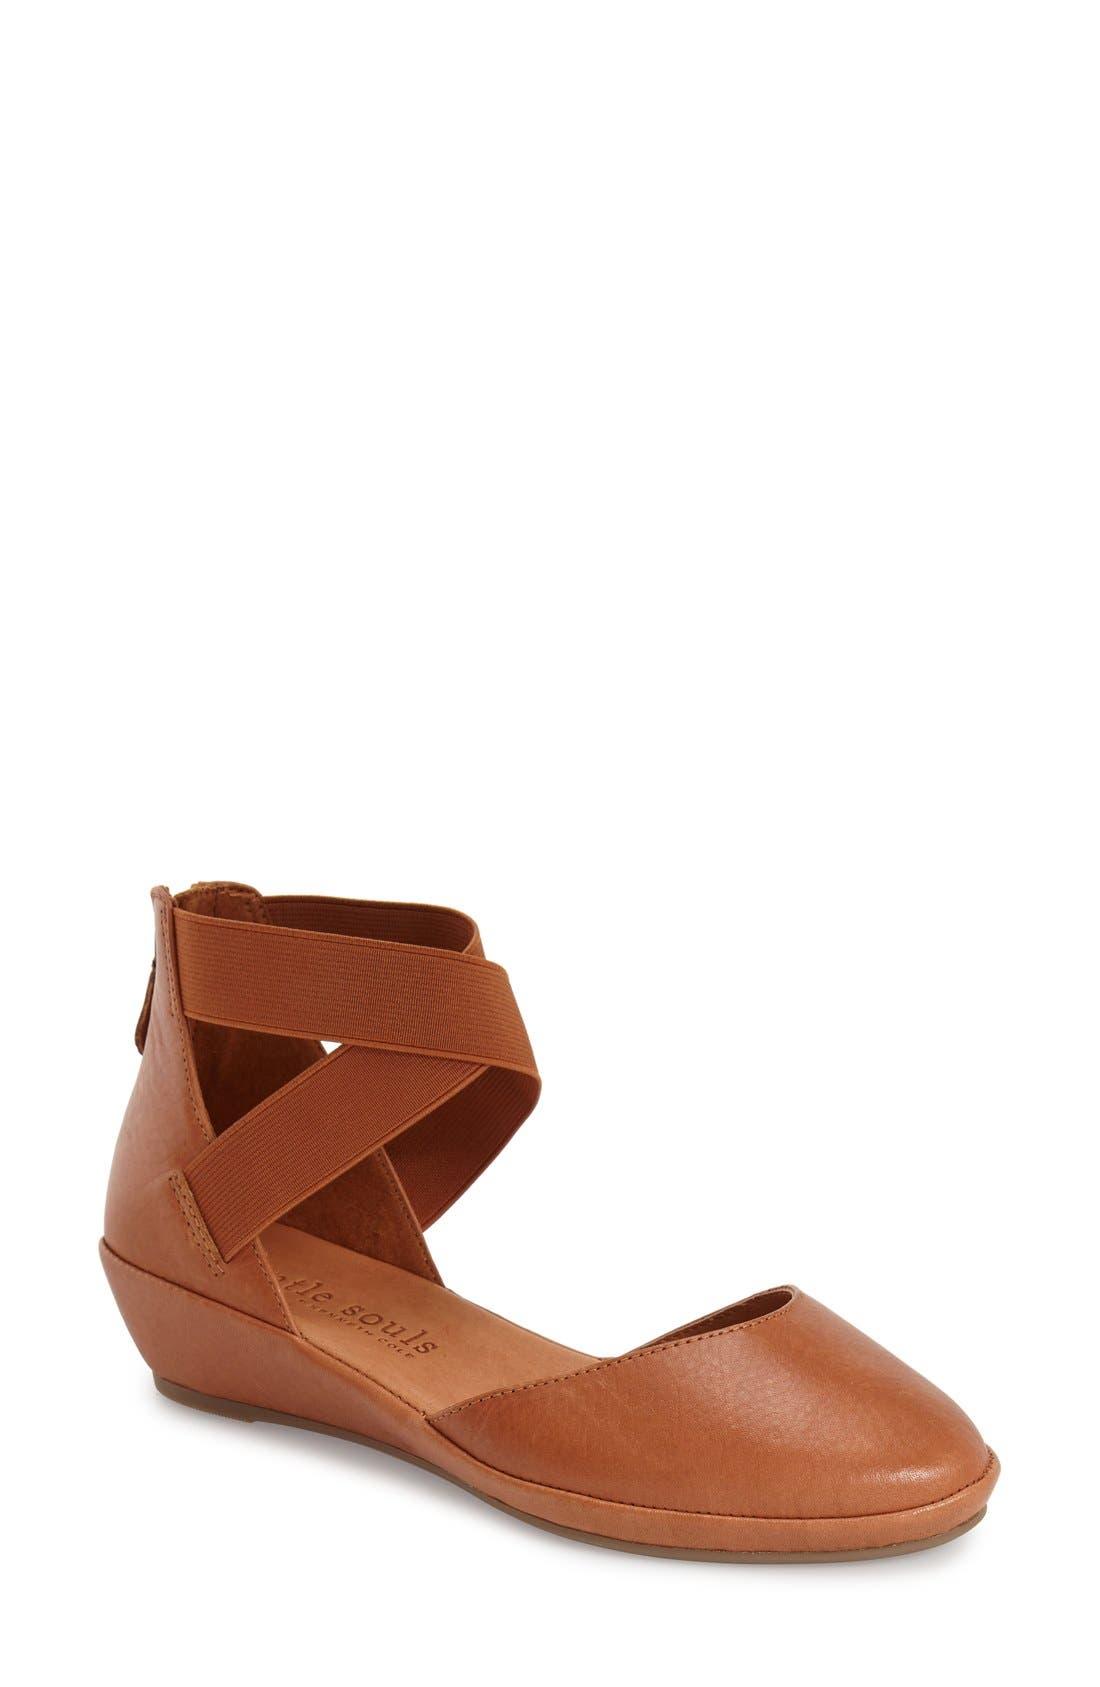 GENTLE SOULS 'Noa' Elastic Strap d'Orsay Sandal